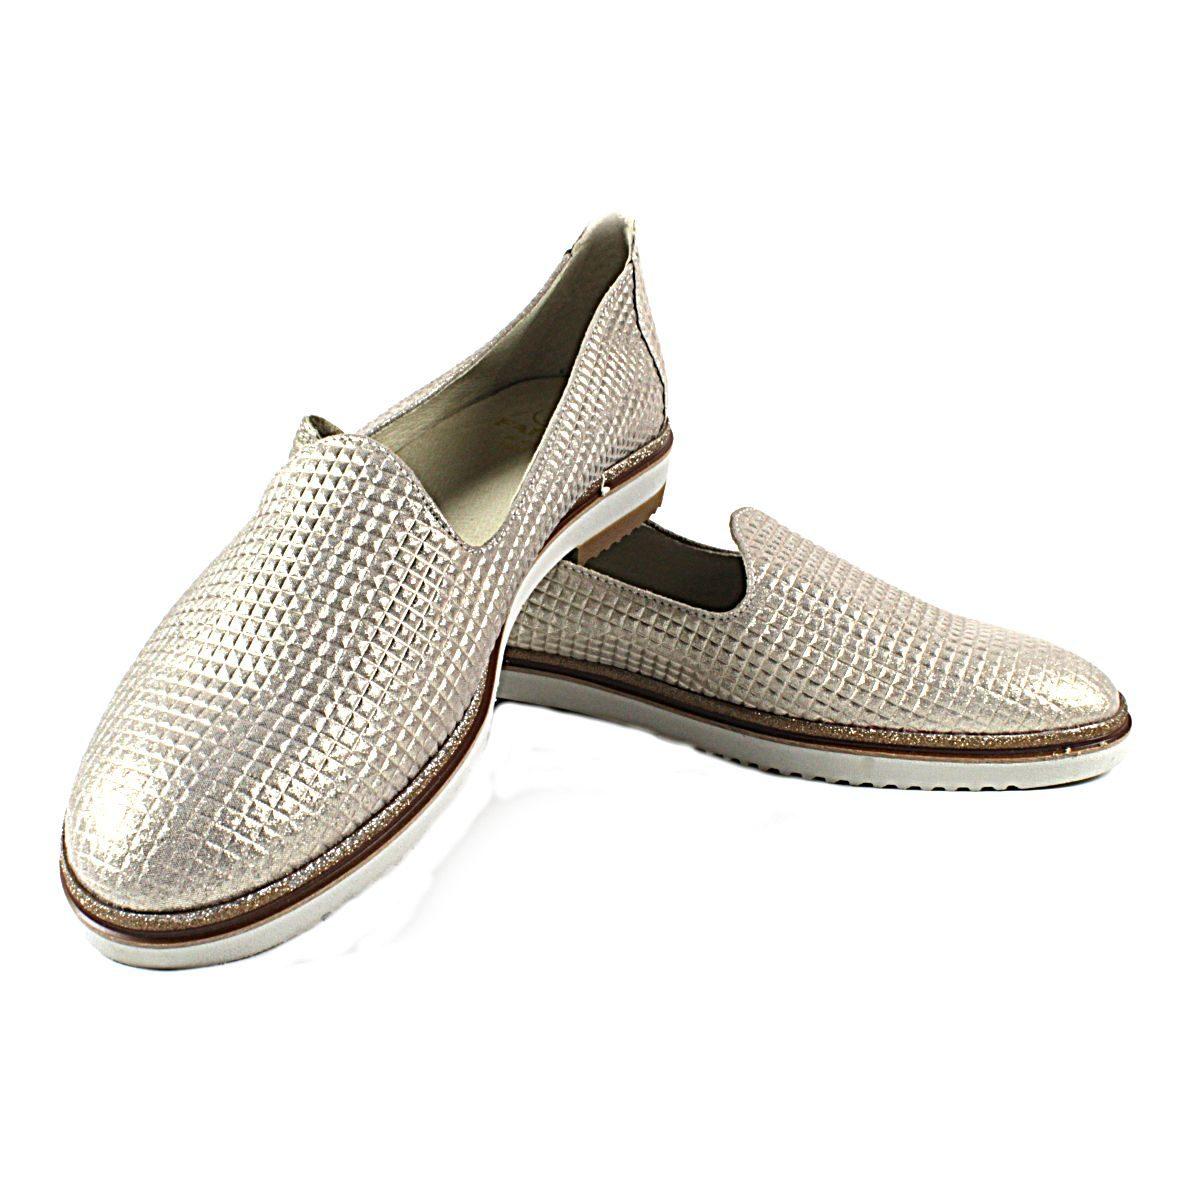 Златисти Дамски Обувки Естествена Кожа с Щампа